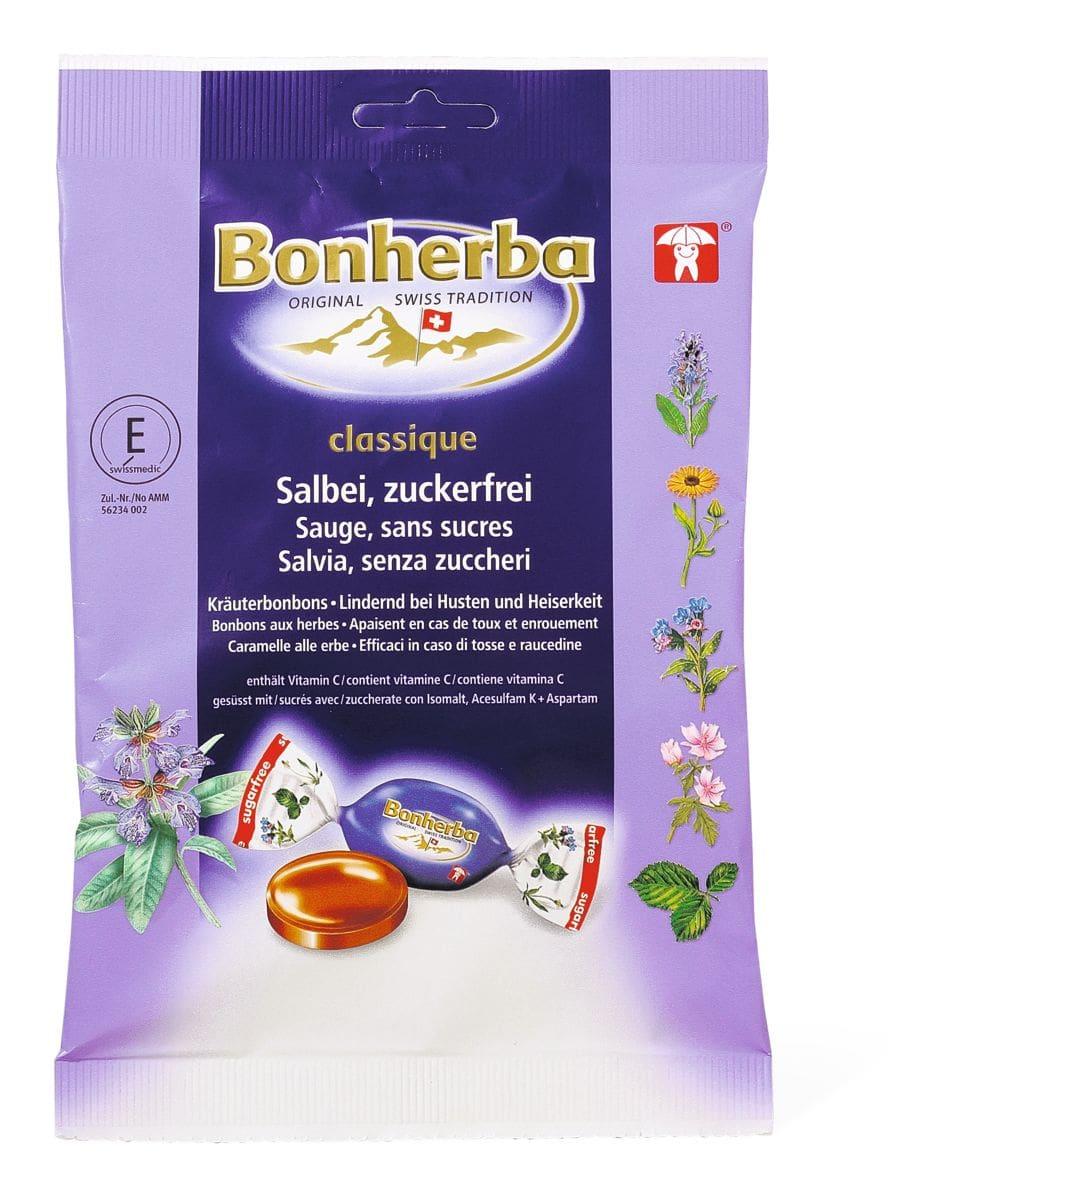 Bonherba Kräuterbonbons mit Salbei